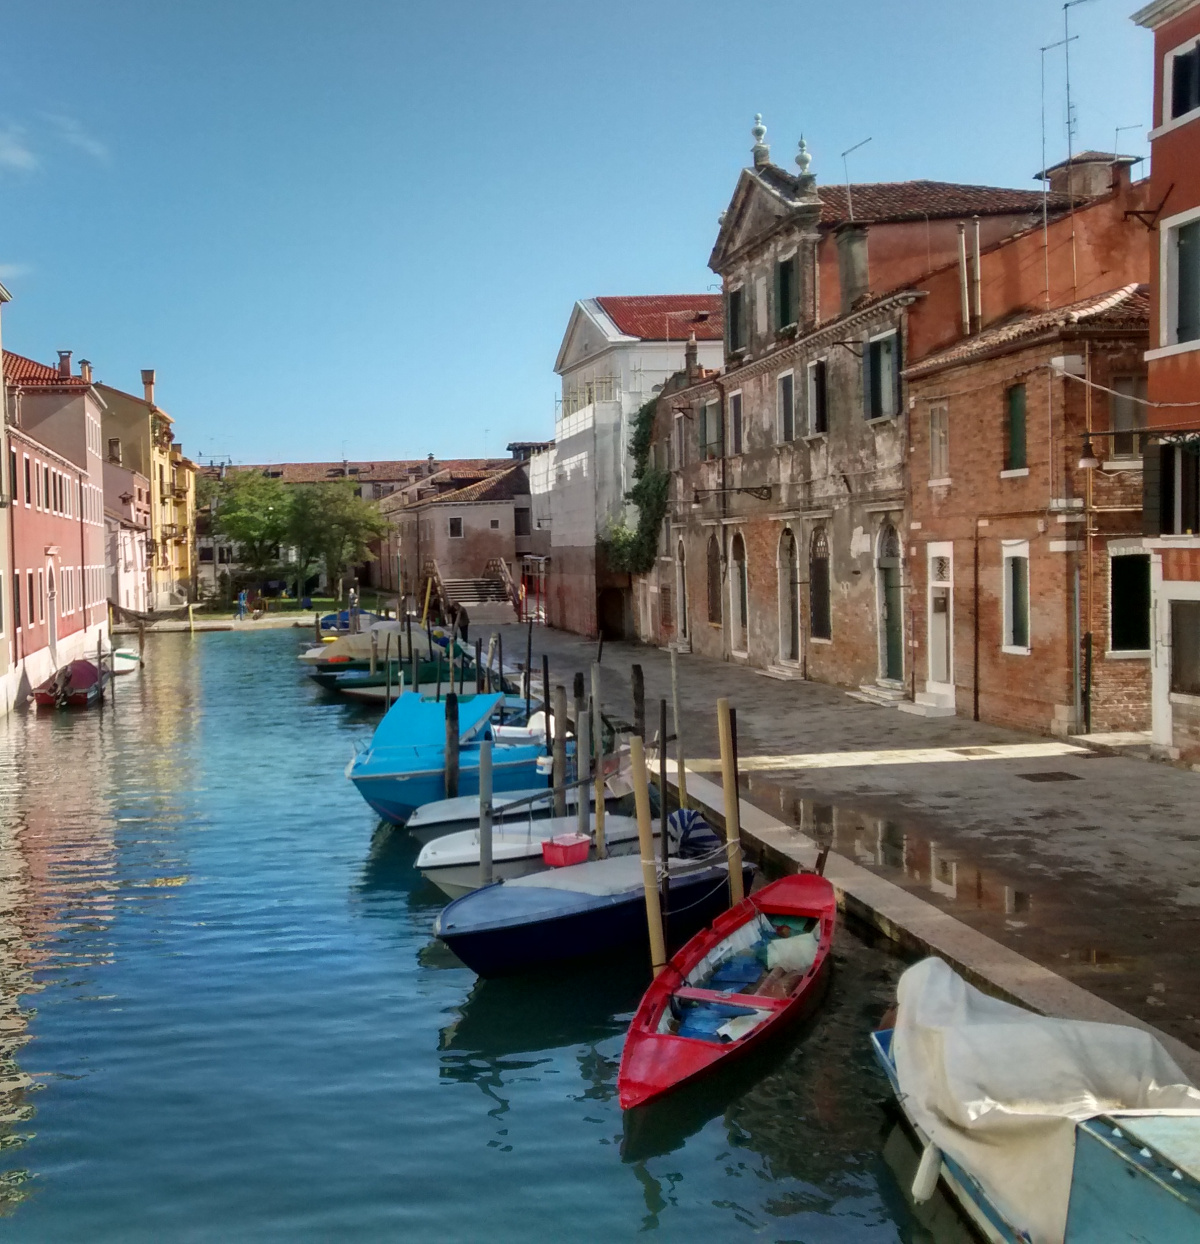 Giudecca Island